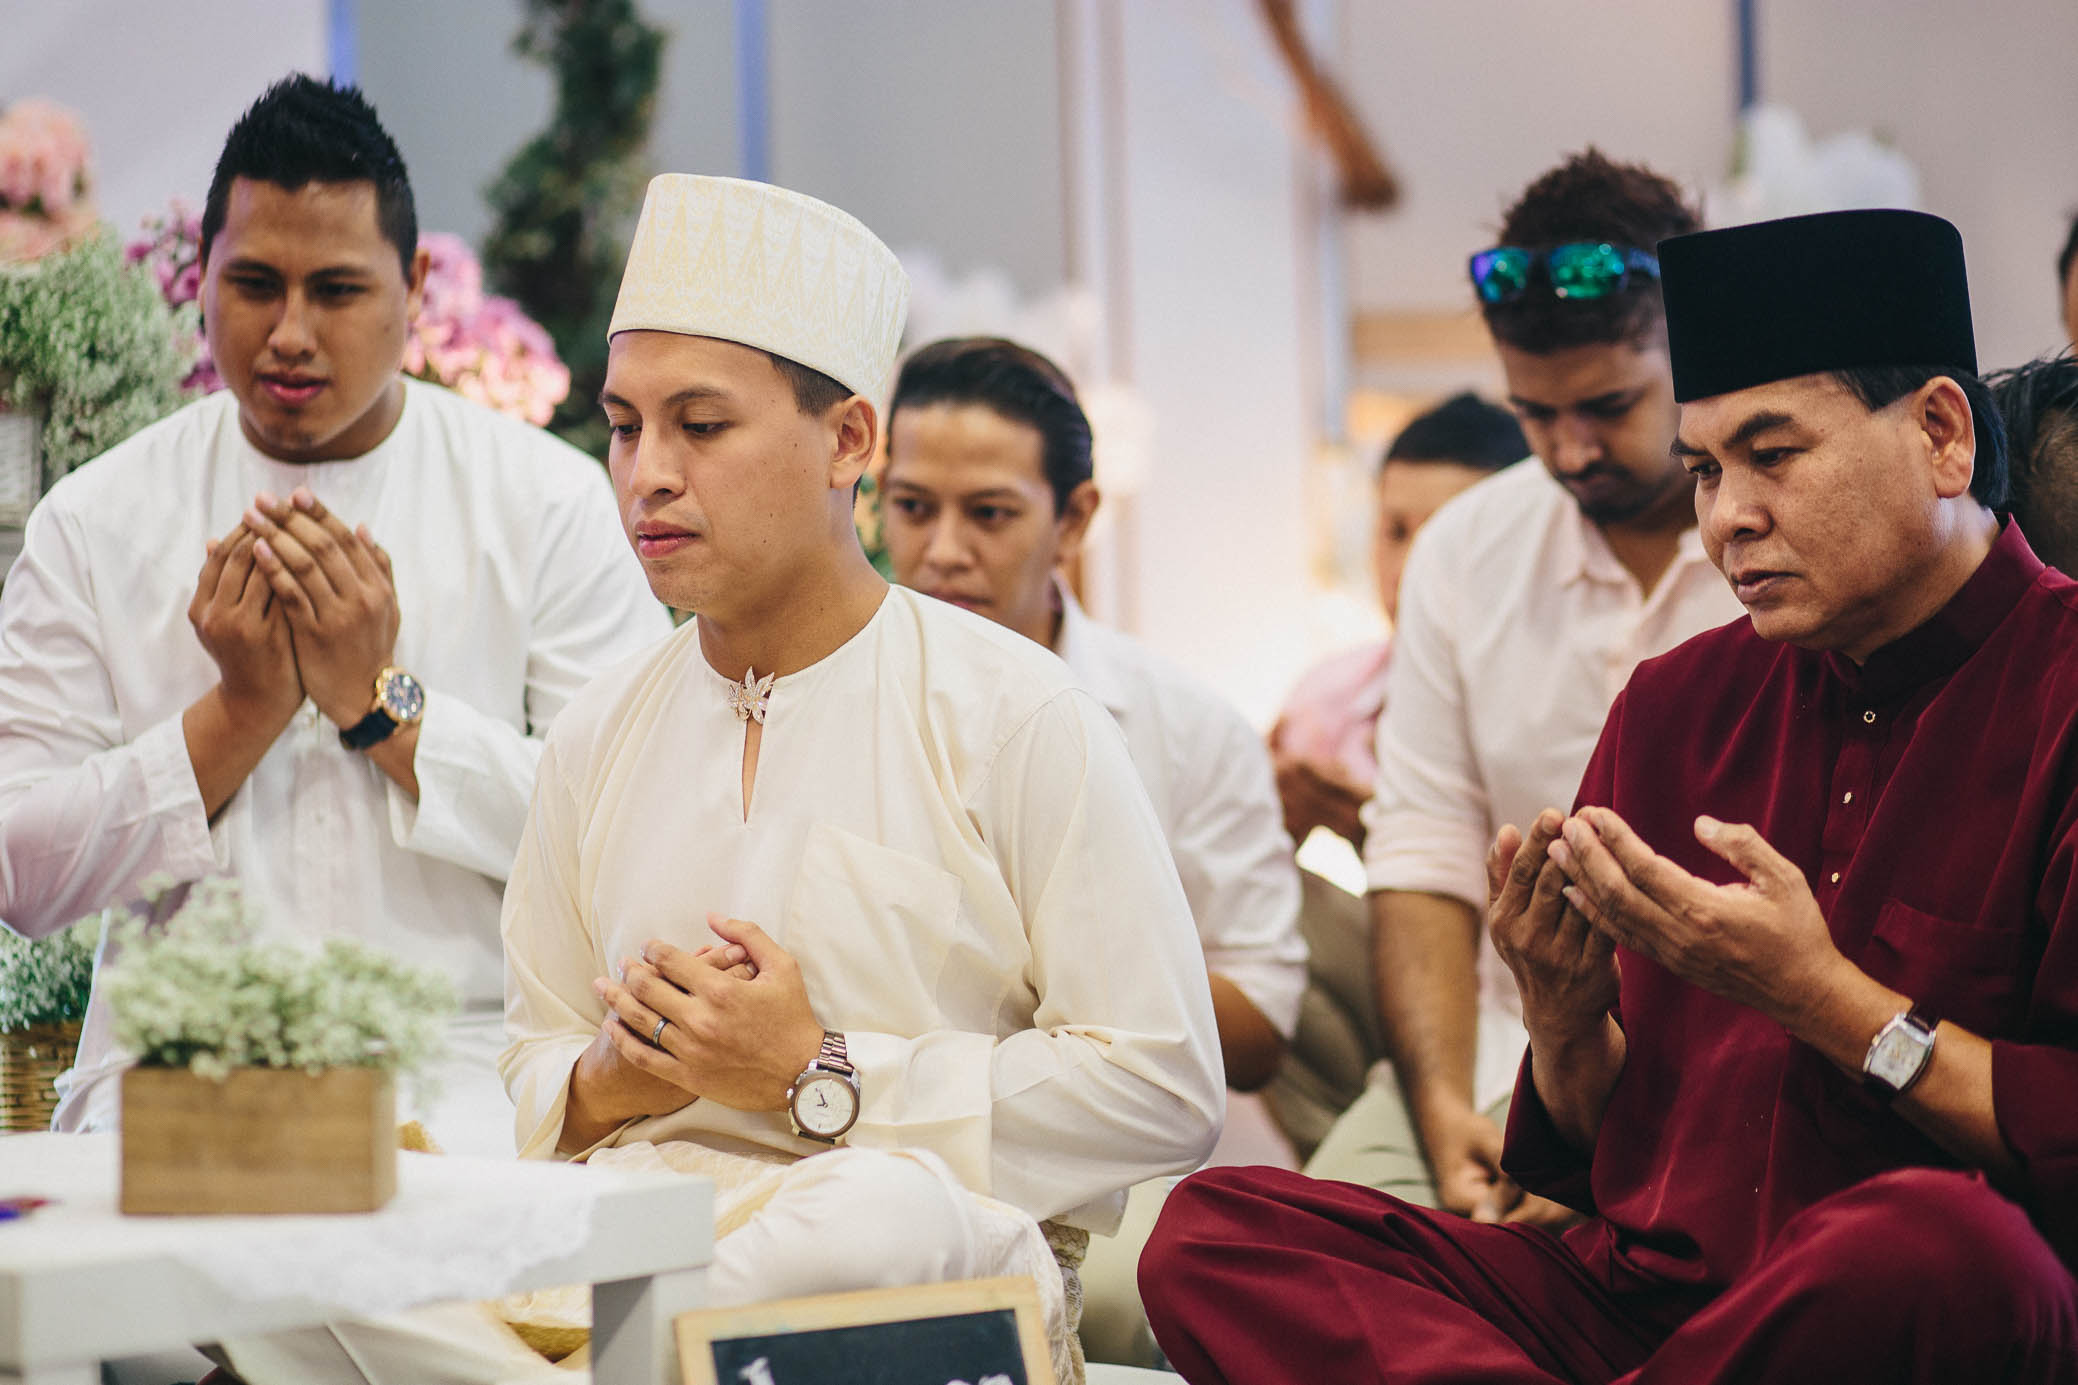 singapore-wedding-photographer-malay-indian-pre-wedding-travel-wmt-2015-alif-ethel-31.jpg